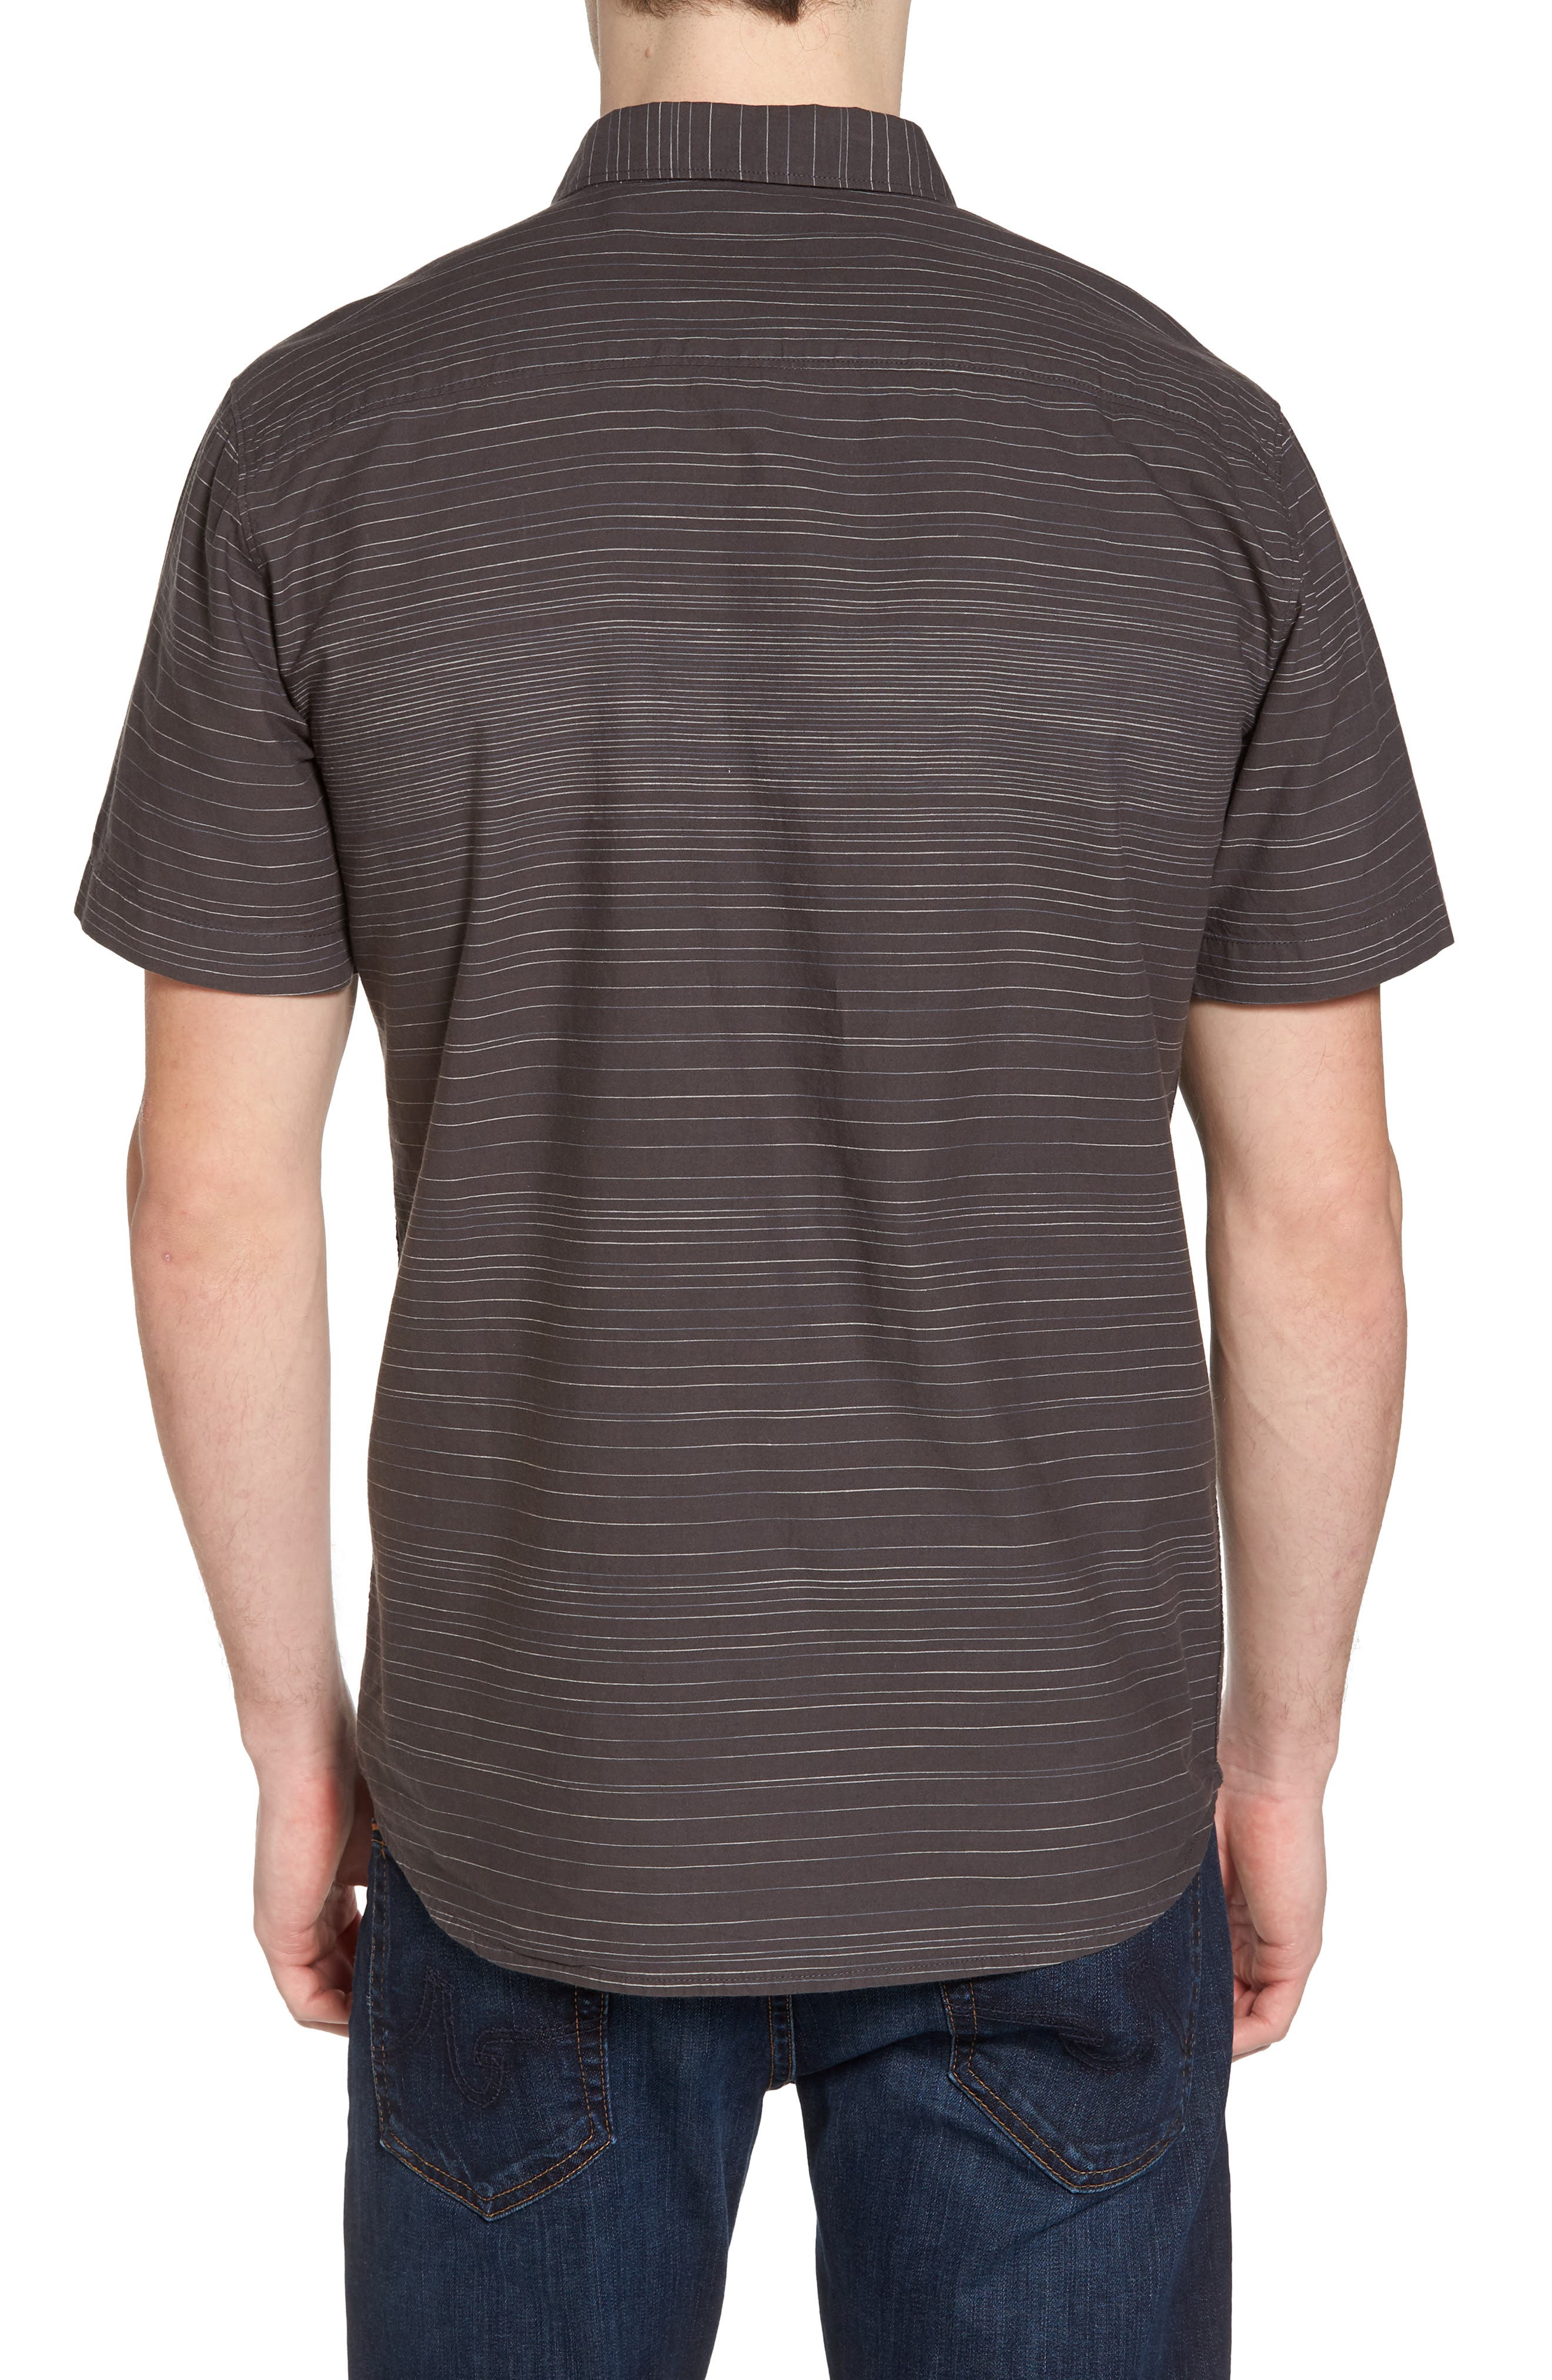 Hound Woven Shirt,                             Alternate thumbnail 2, color,                             Asphalt